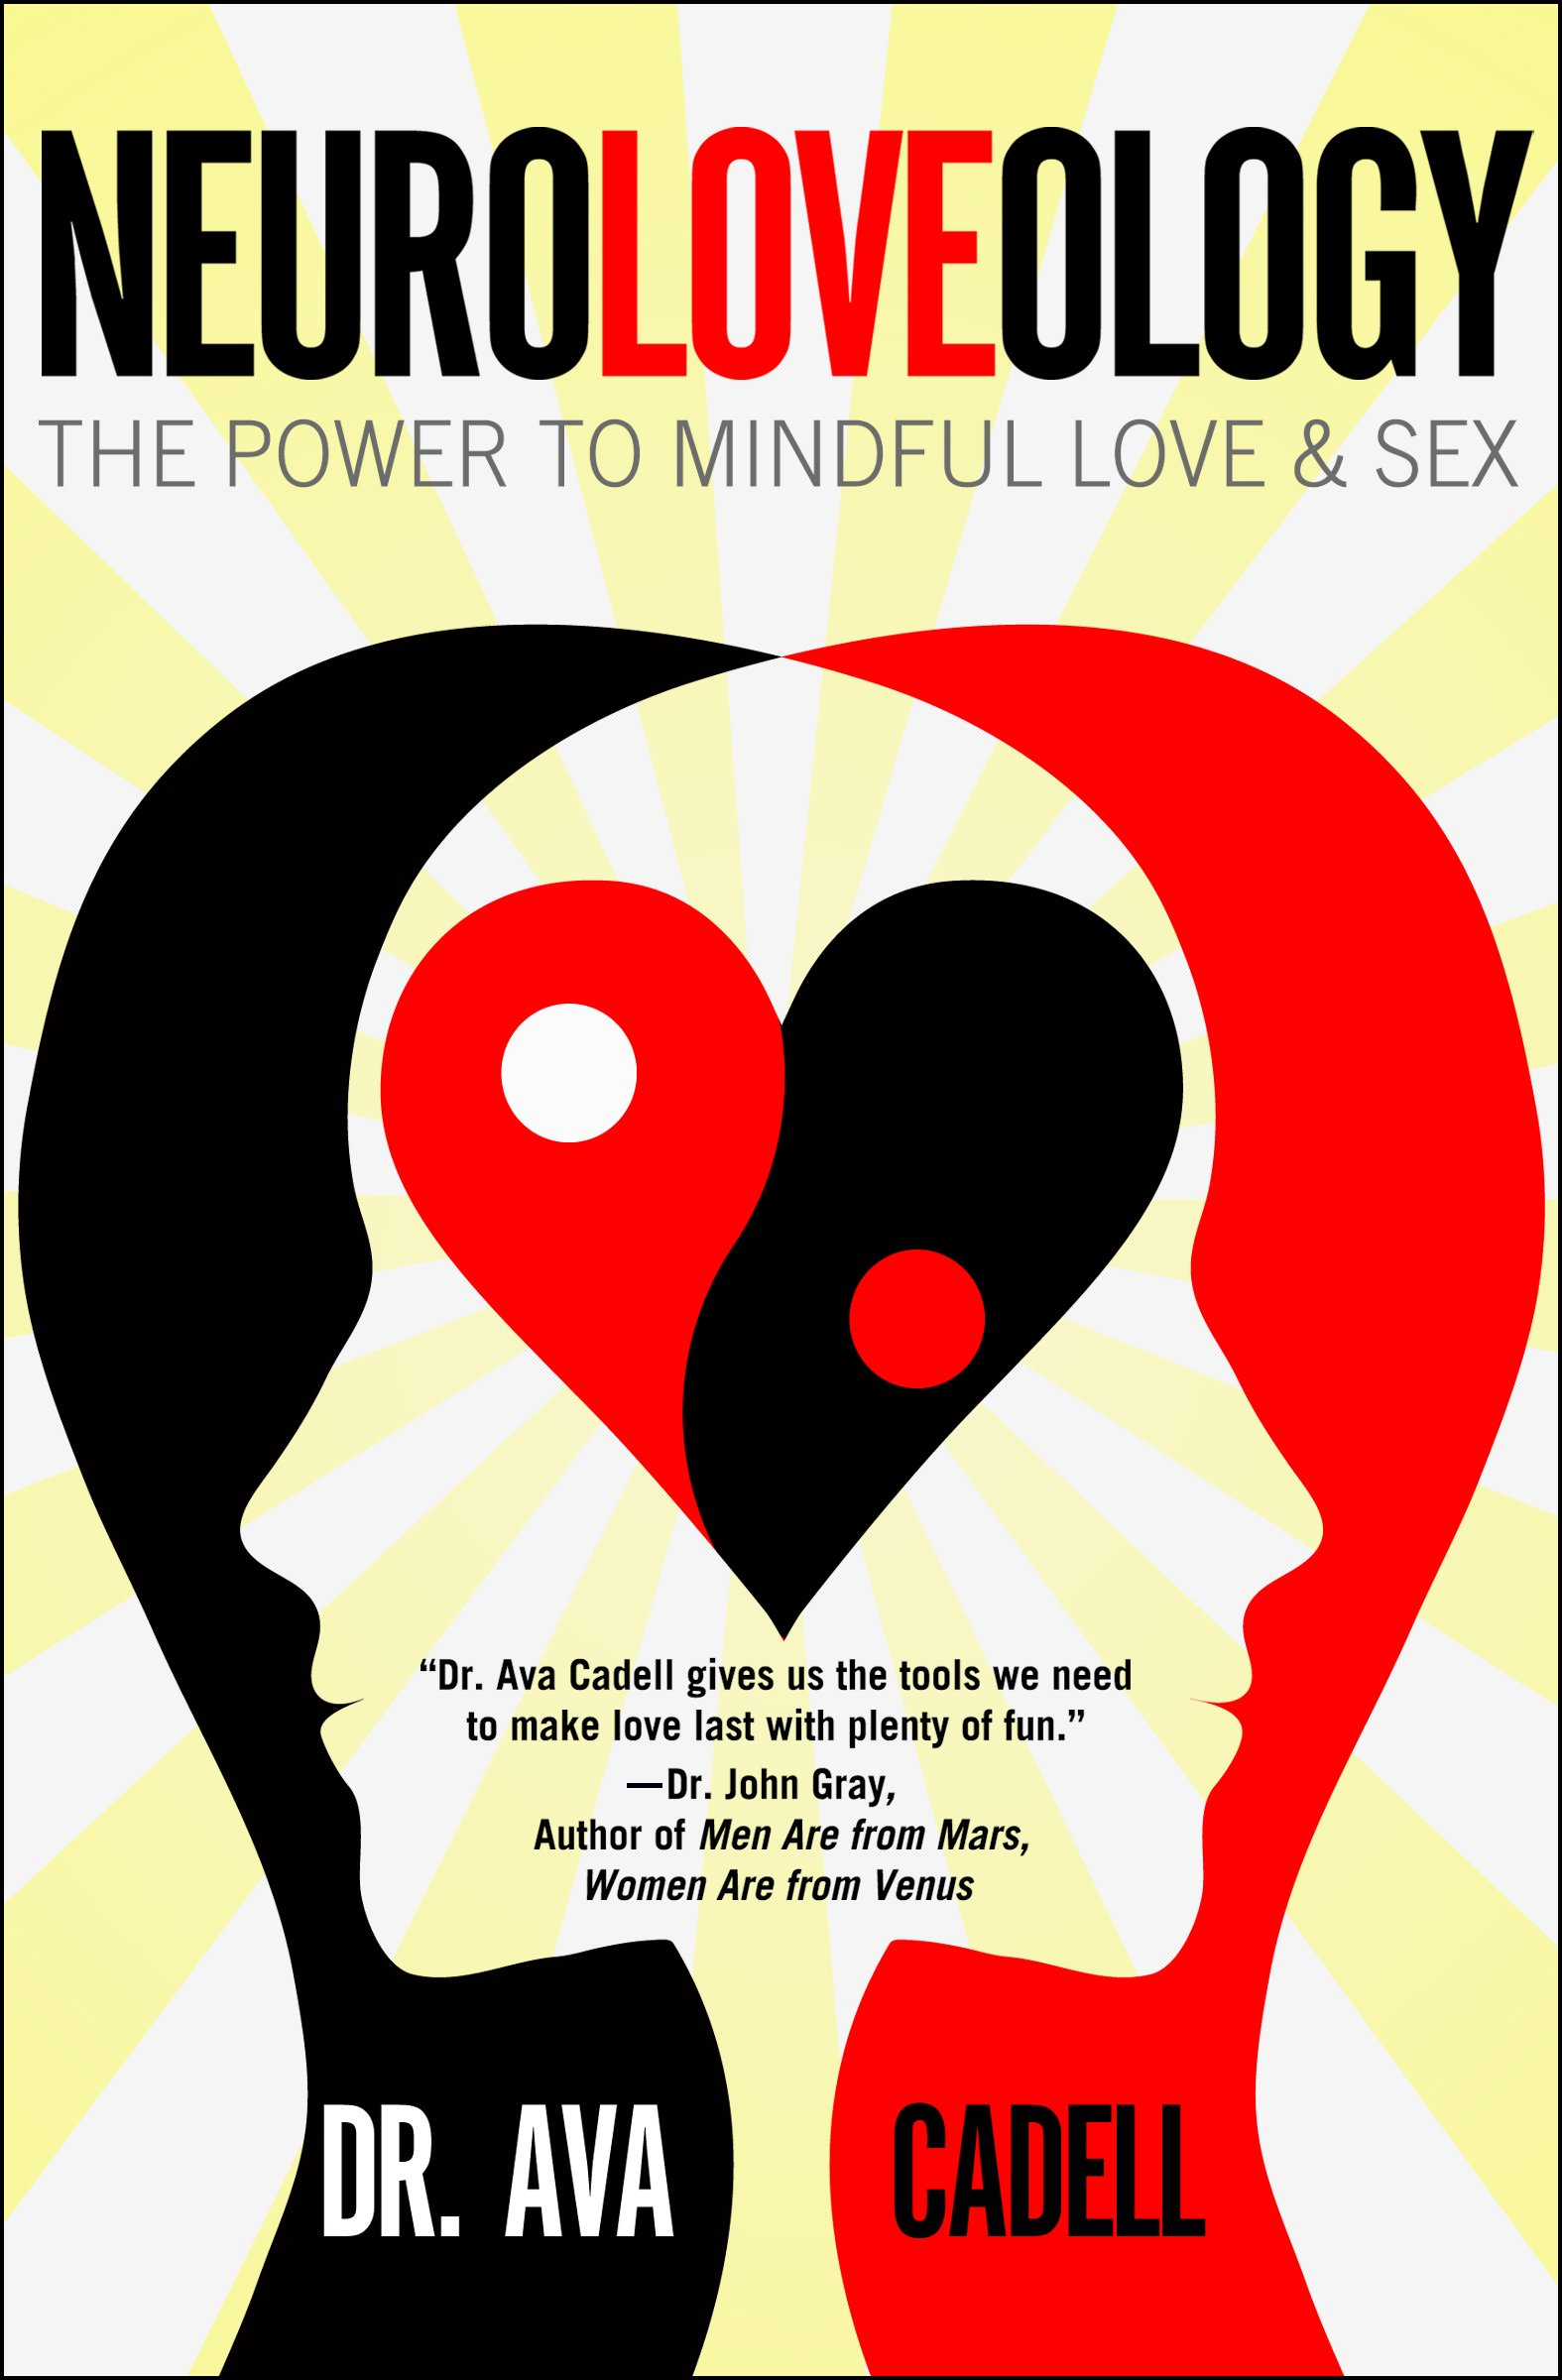 Neuroloveology: The Power To Mindful Love & Sex